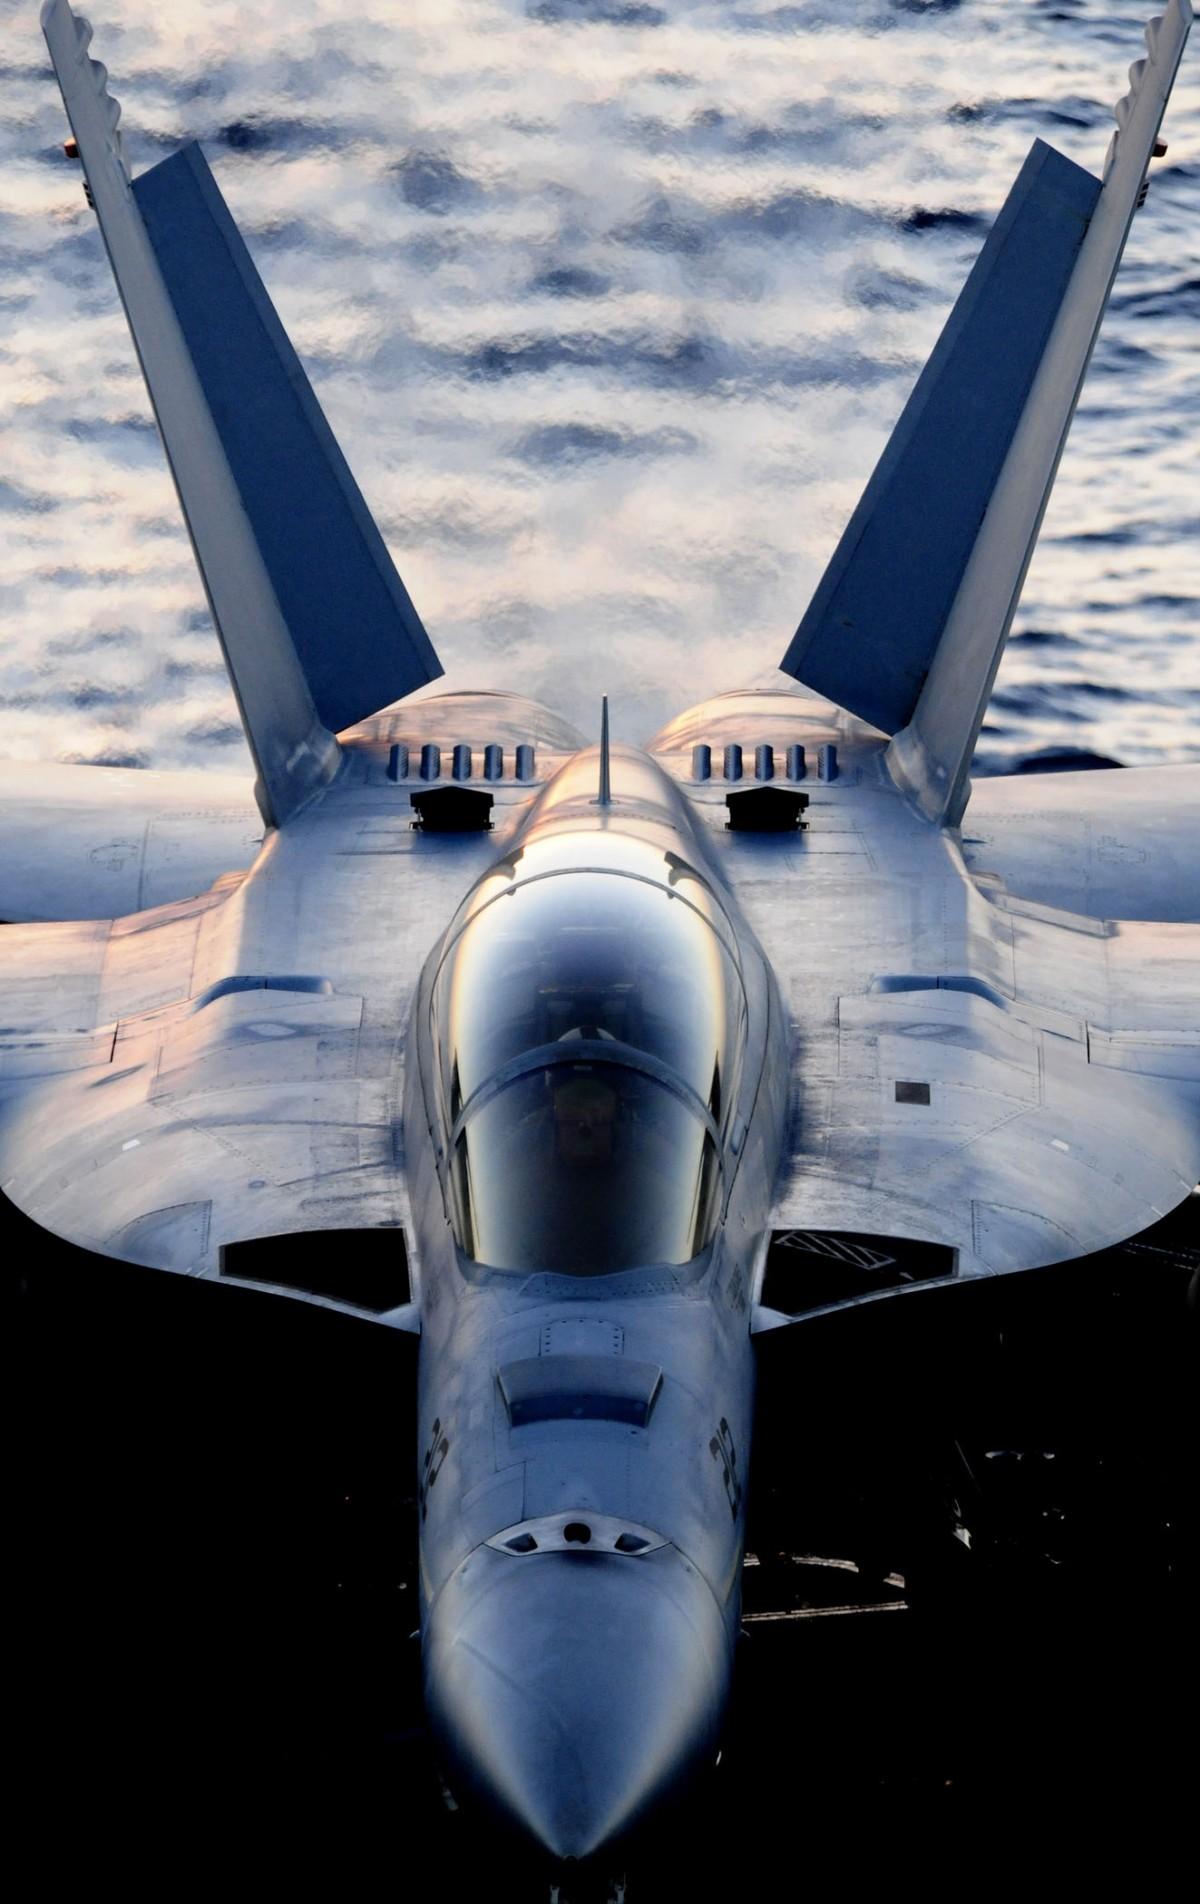 Free Images : Wing, Sunrise, Sunset, Ground, Airplane